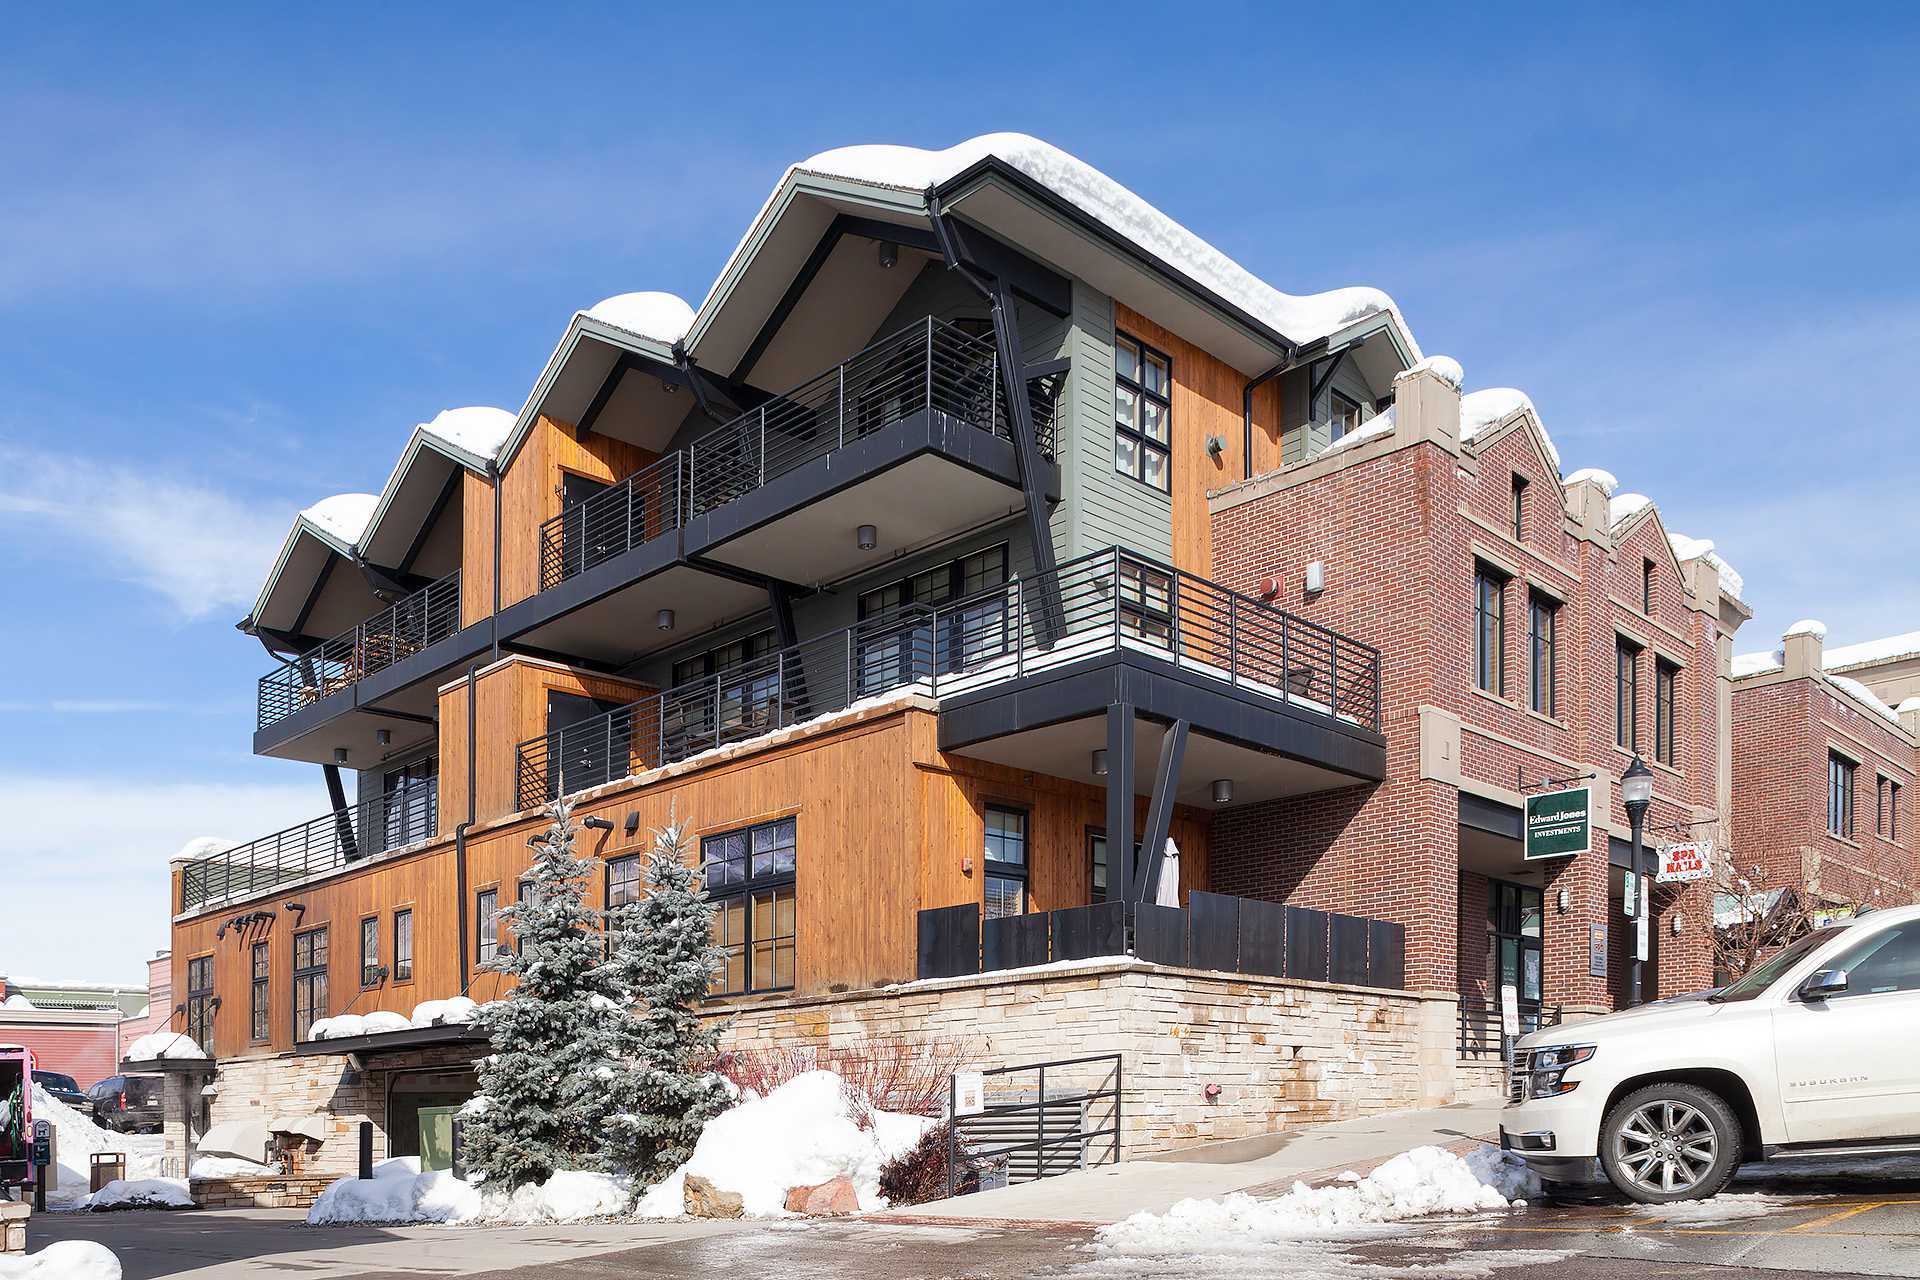 ALP2C - Alpenglow Condominiums